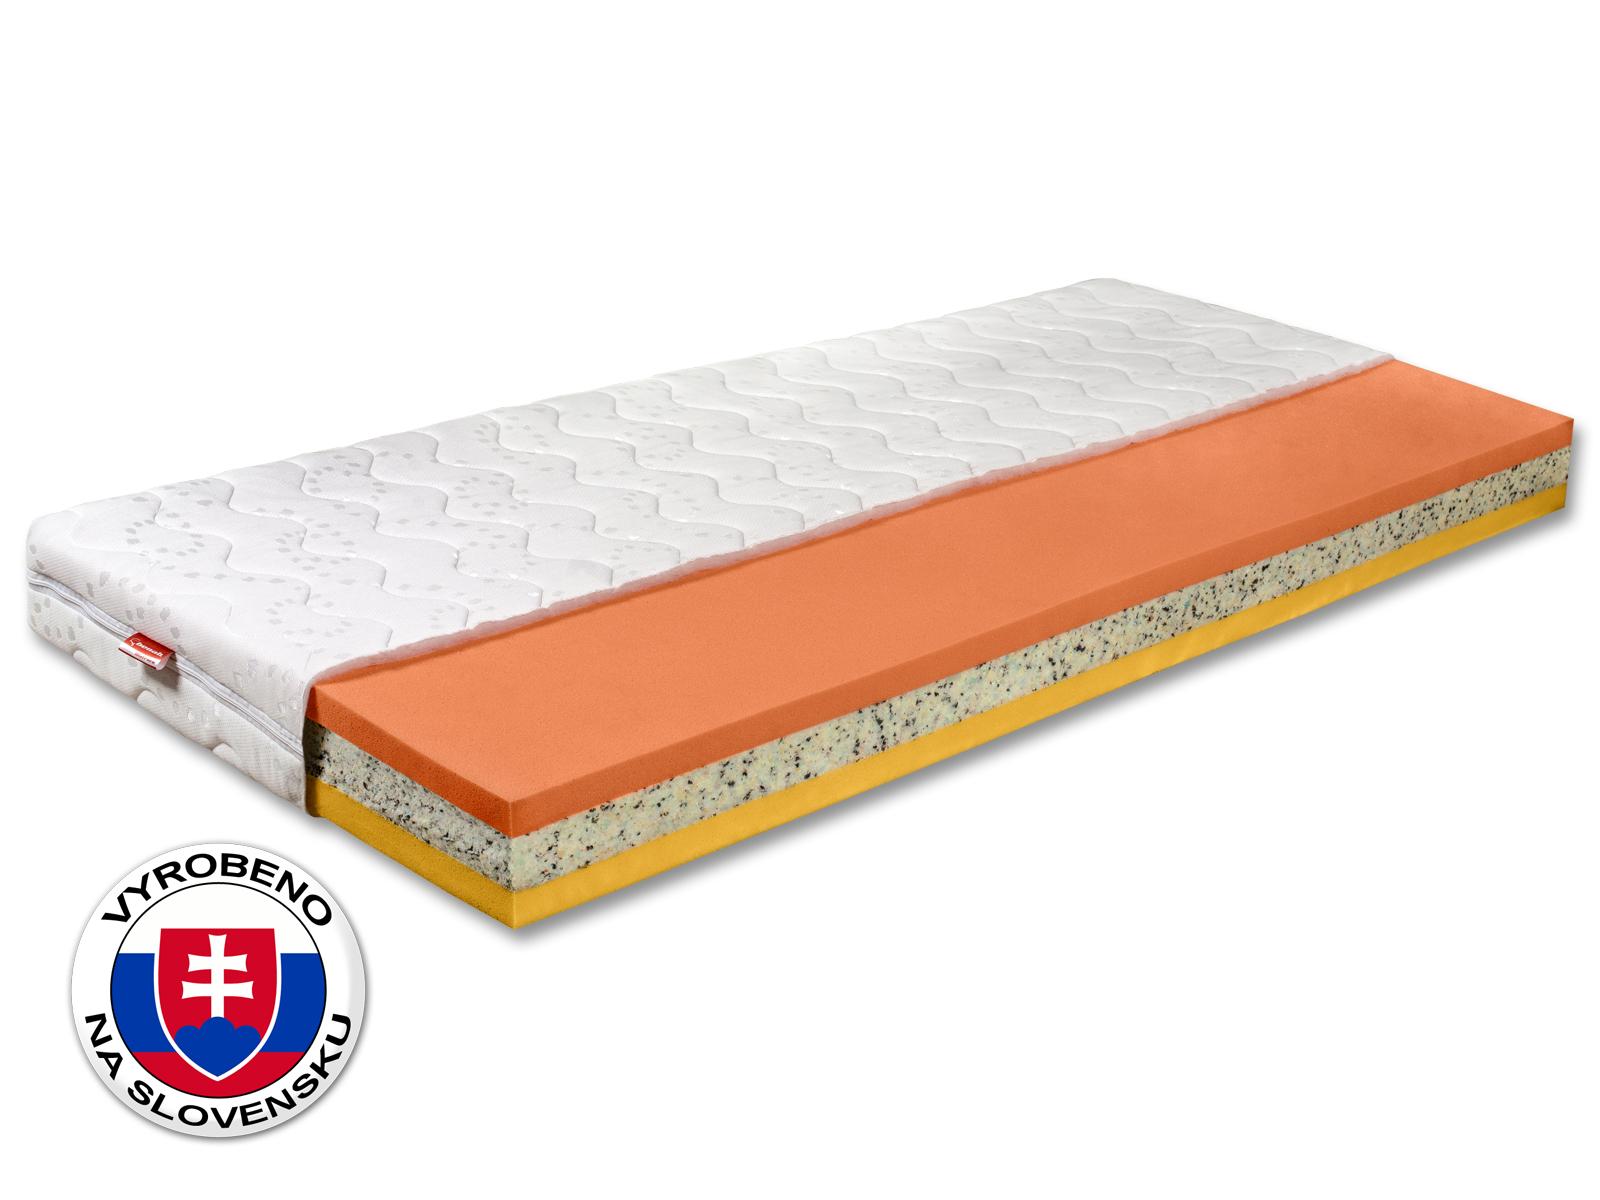 Pěnová matrace - Benab - Hard Plus - 195x80 cm (T3/T4)